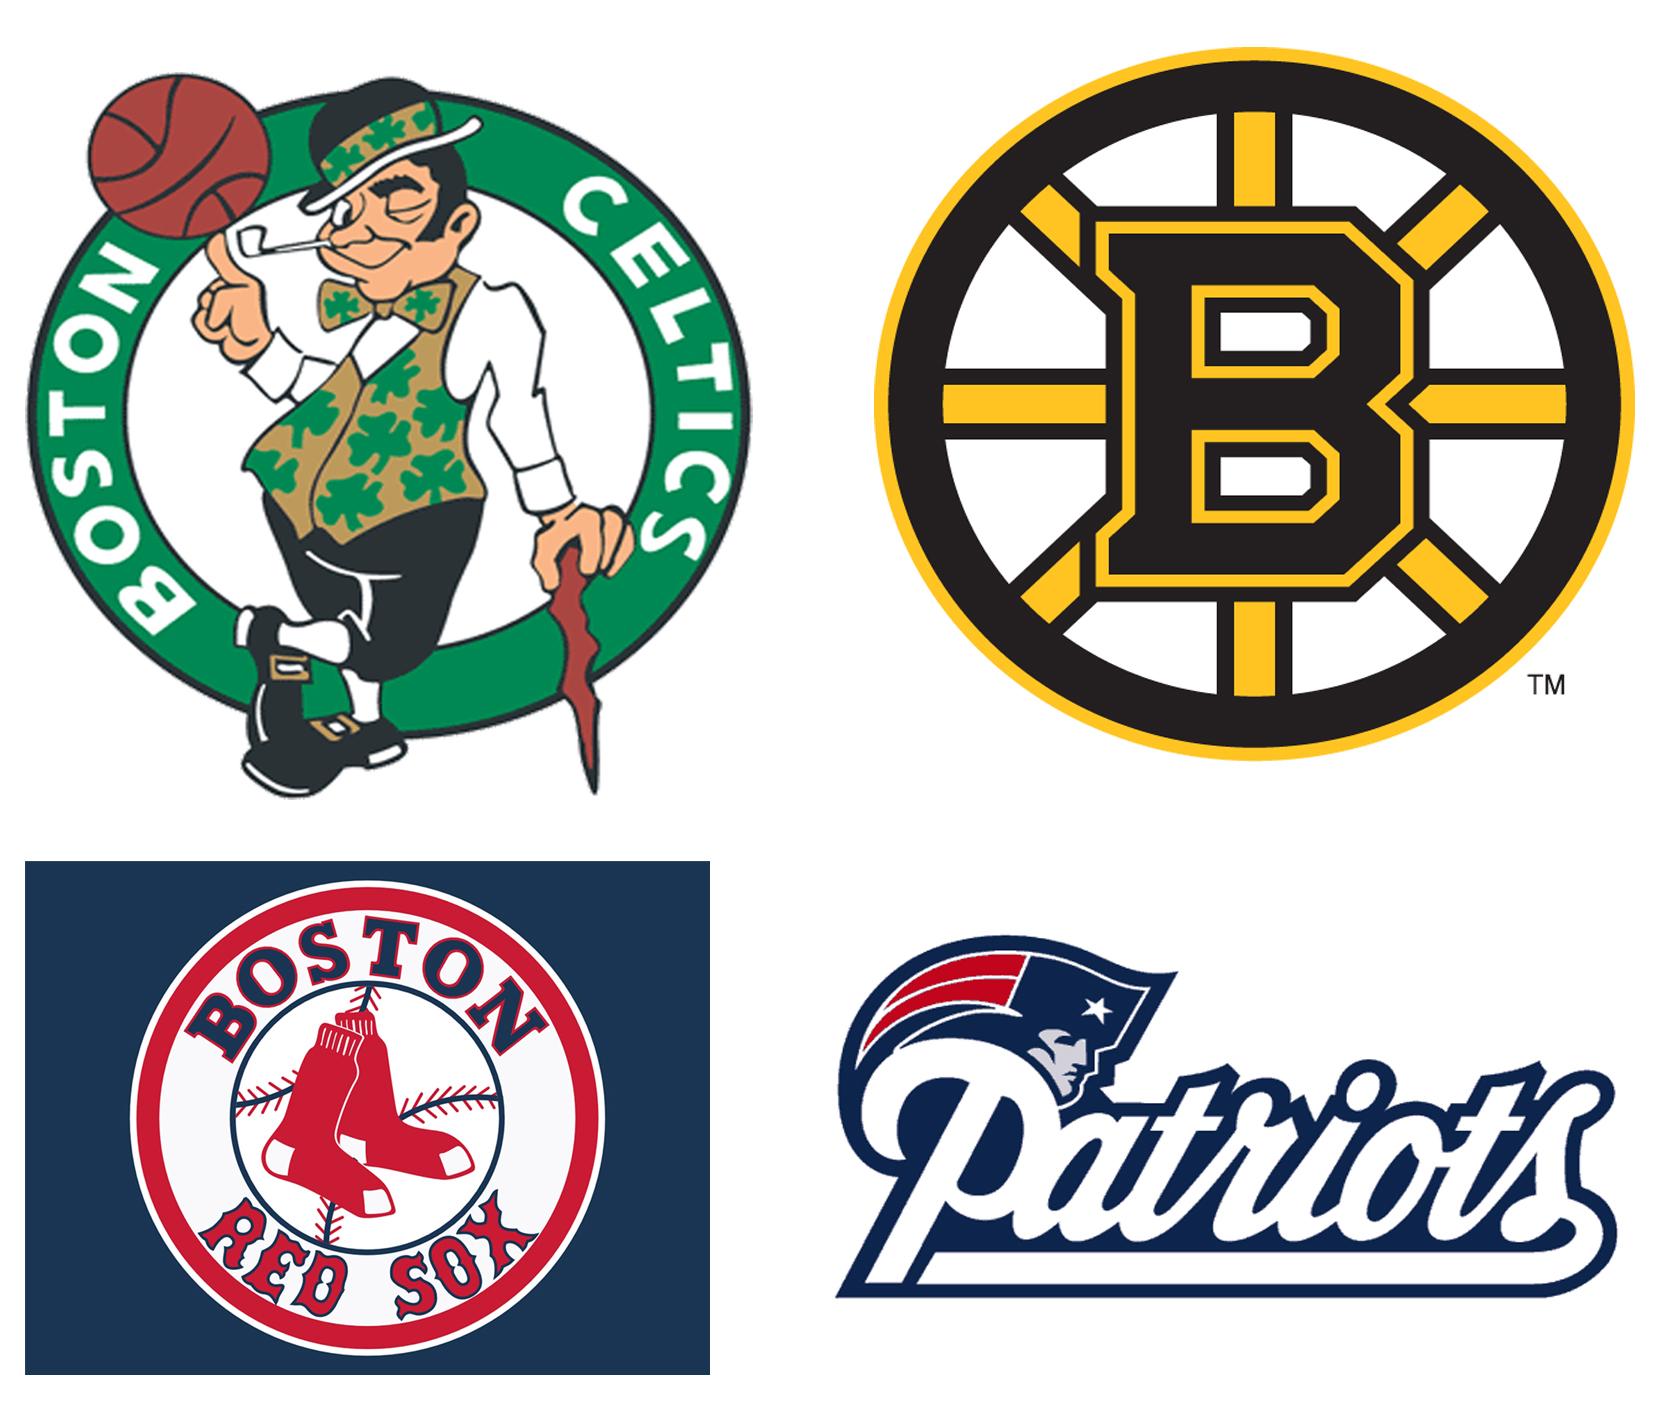 Boston Sports Championship Wallpaper 1664x1415